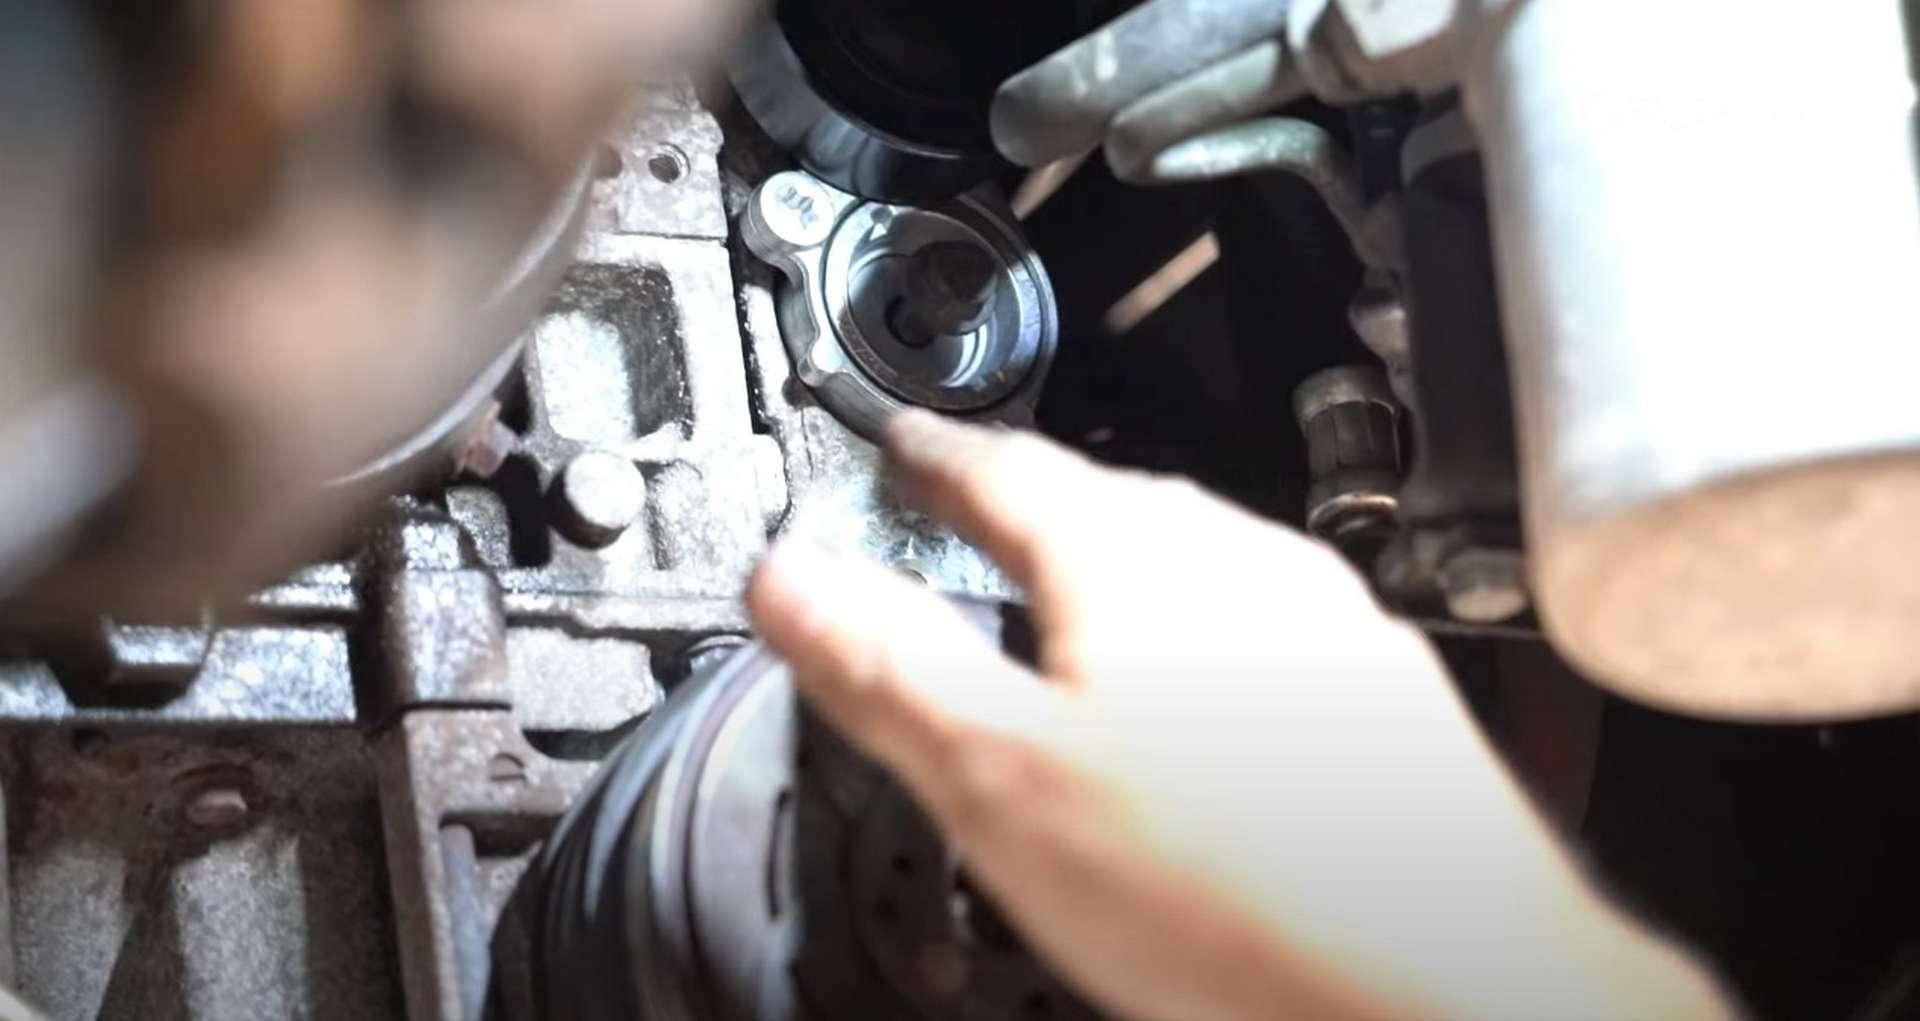 DIY Volvo Alternator and Serpentine Belt Replacement reinstalling the inner tensioner bolt